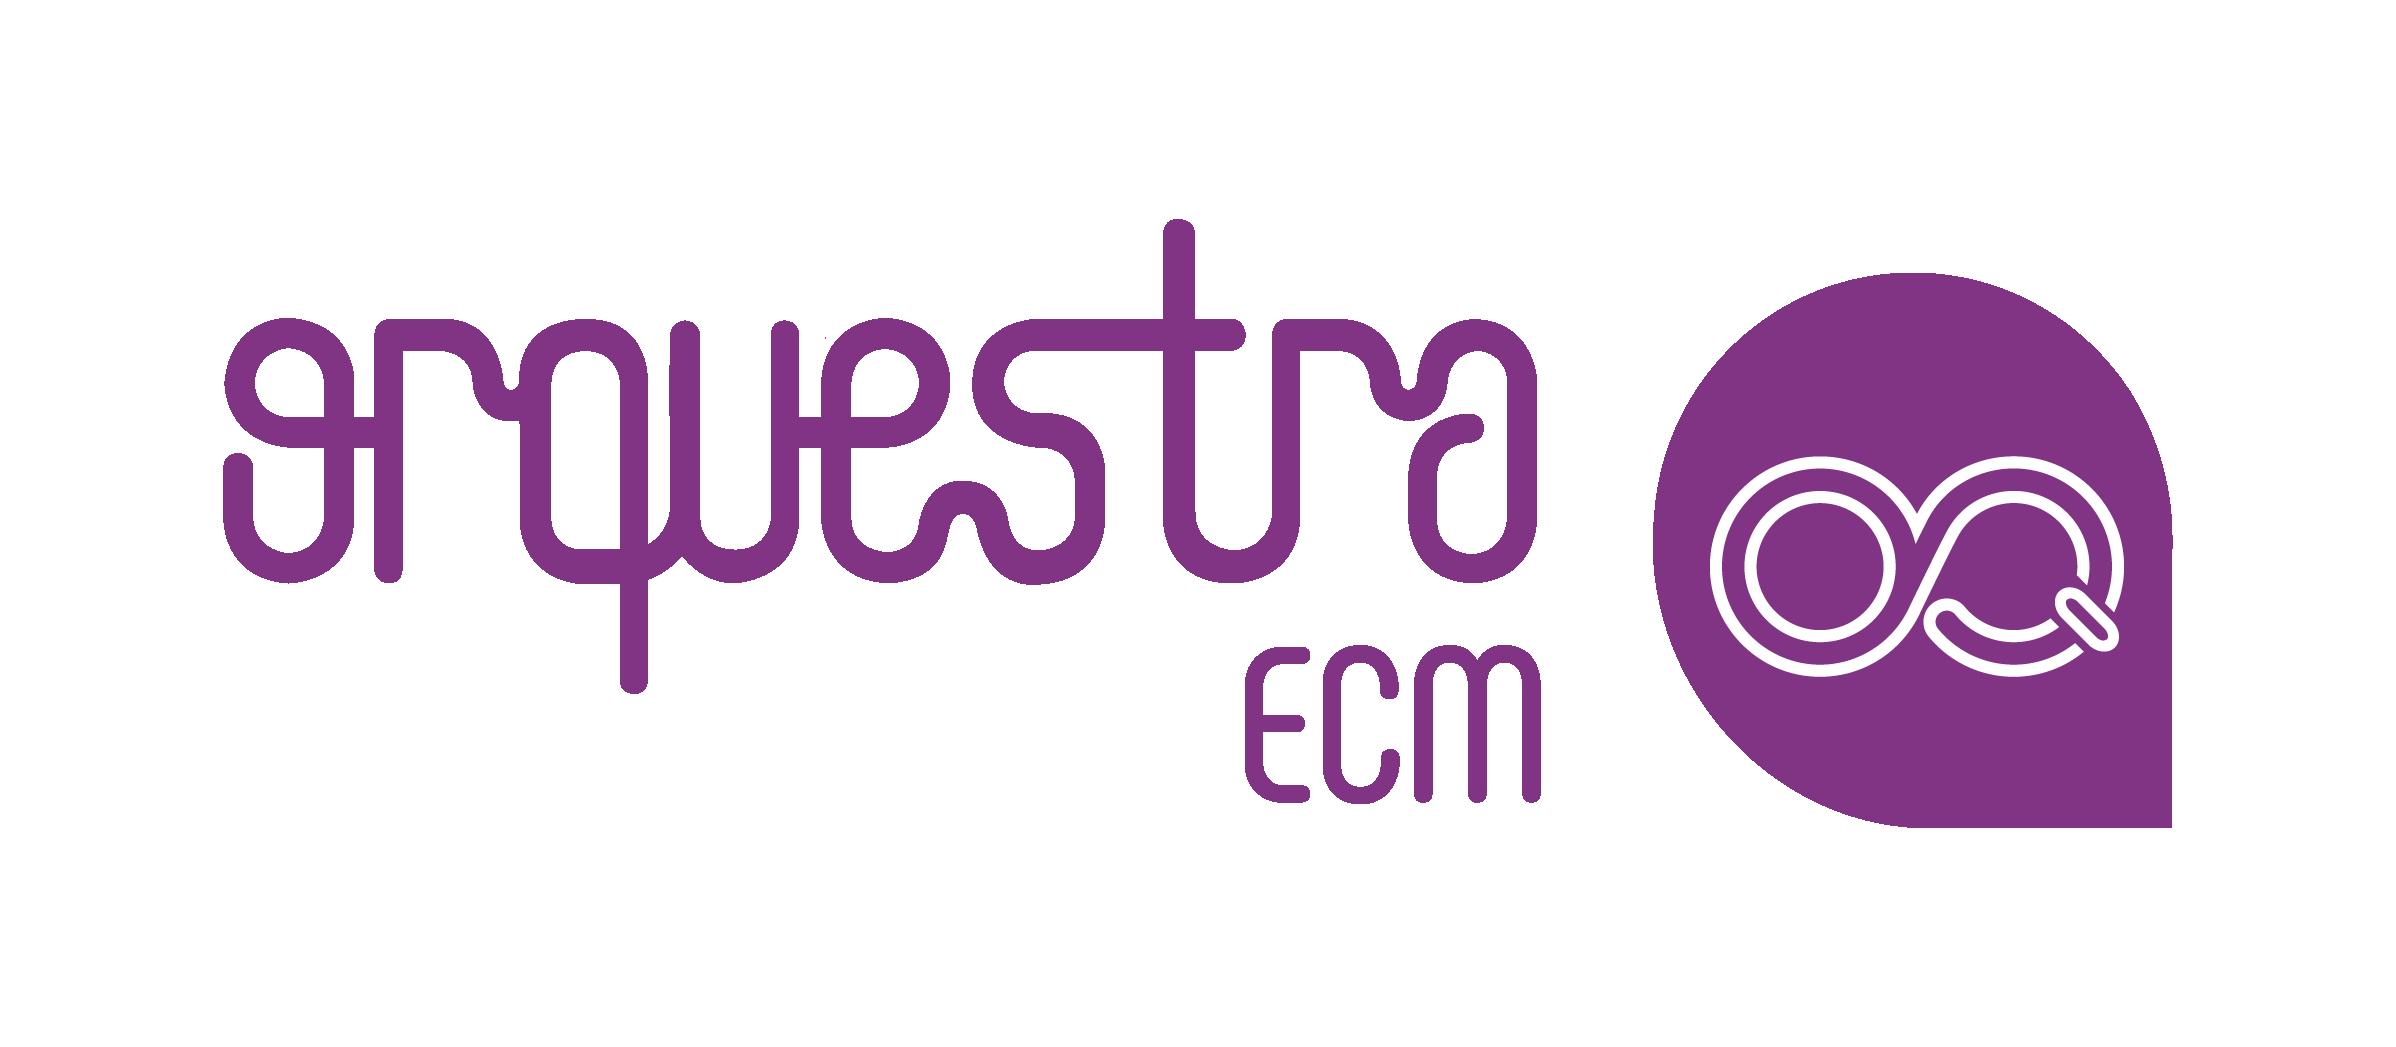 20180129125428 orquestra ecm